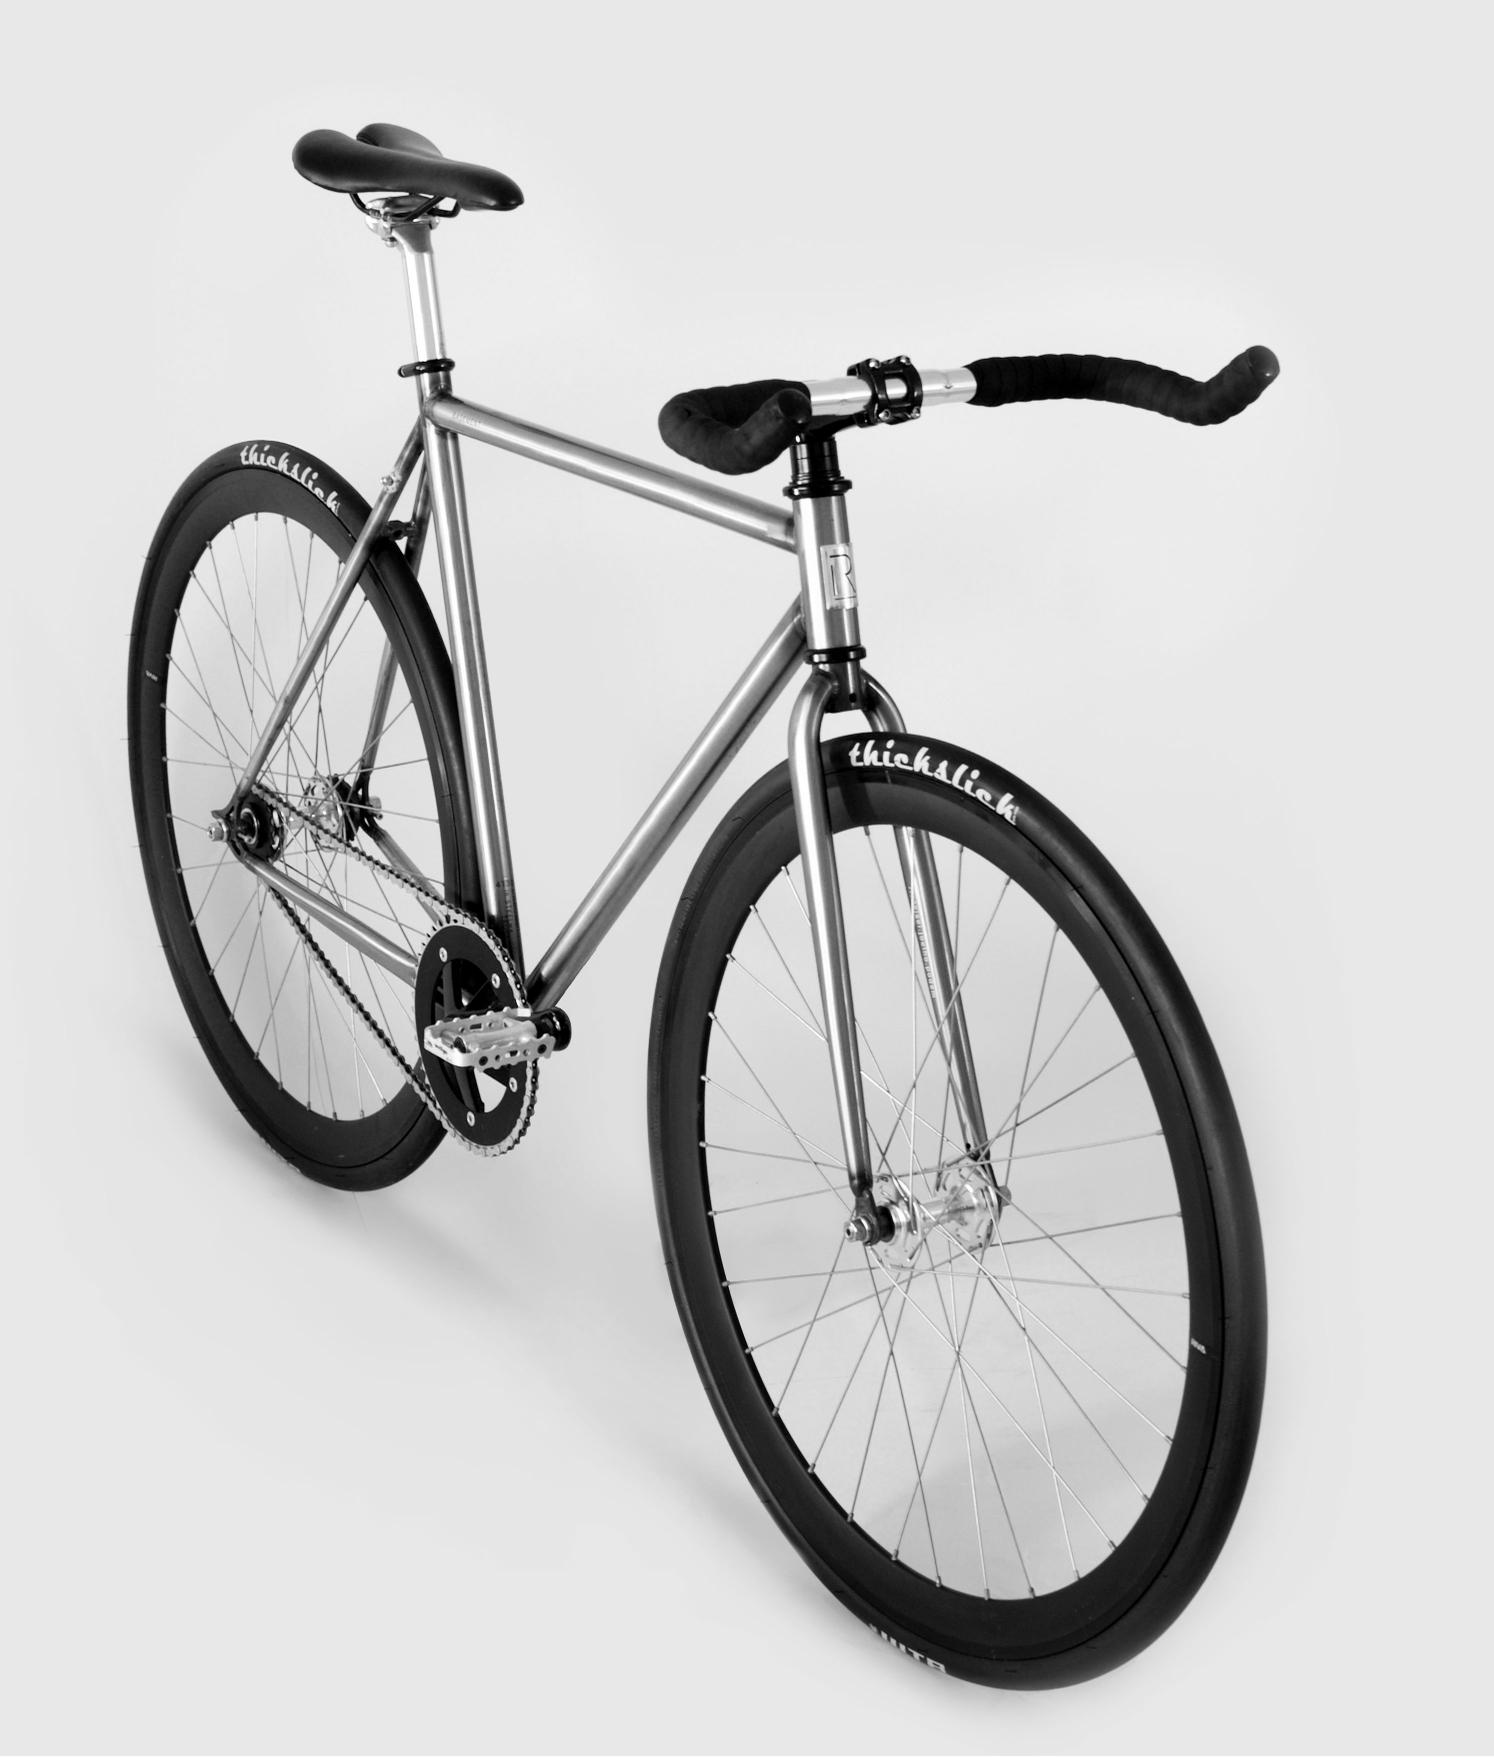 bicicleta-fixa-cromo-molibdênio